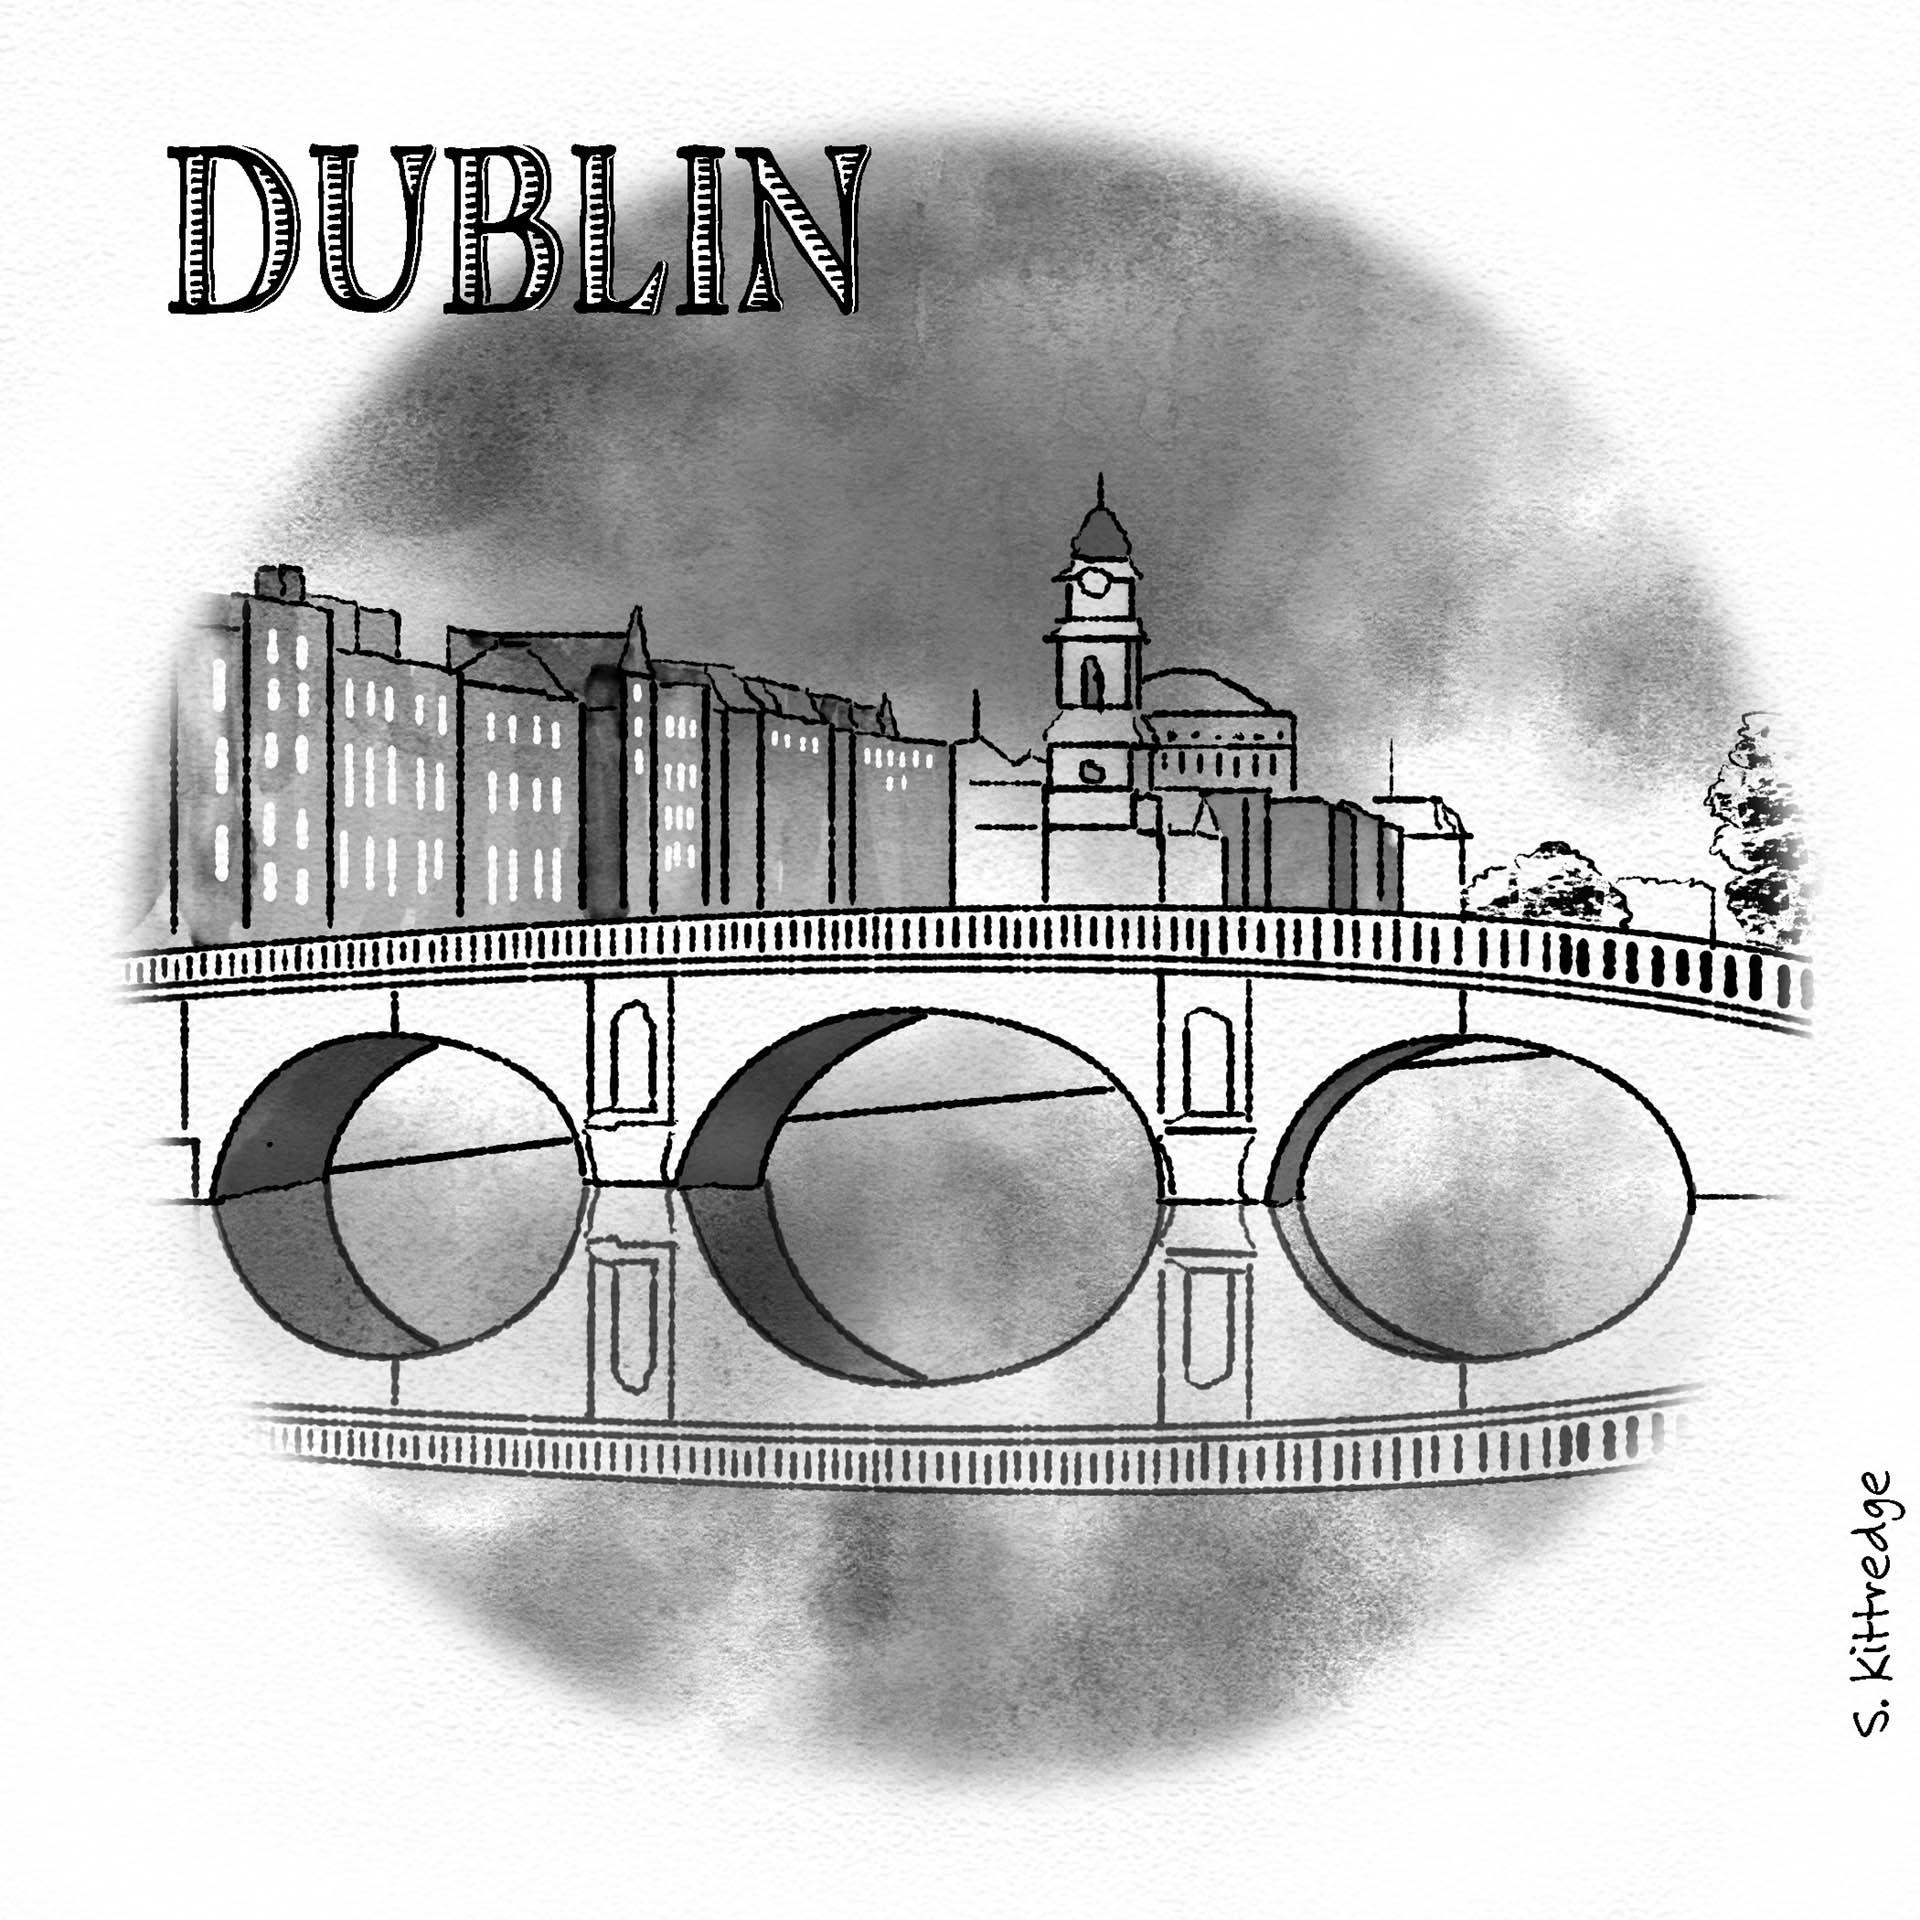 Dublin Inktober Illustration 2020 • Project: They Draw & Travel